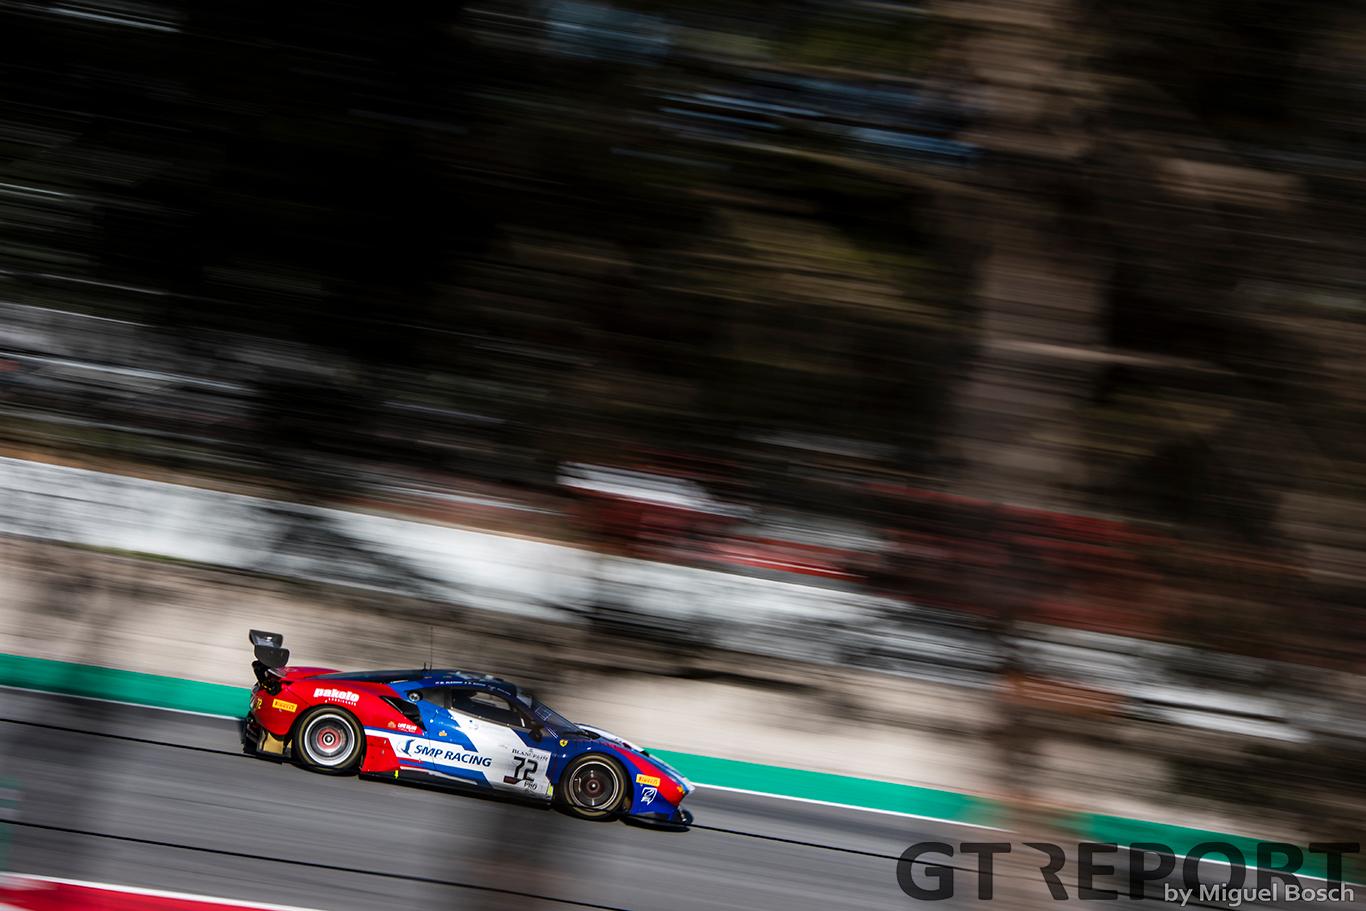 Blancpain GT Barcelona race report